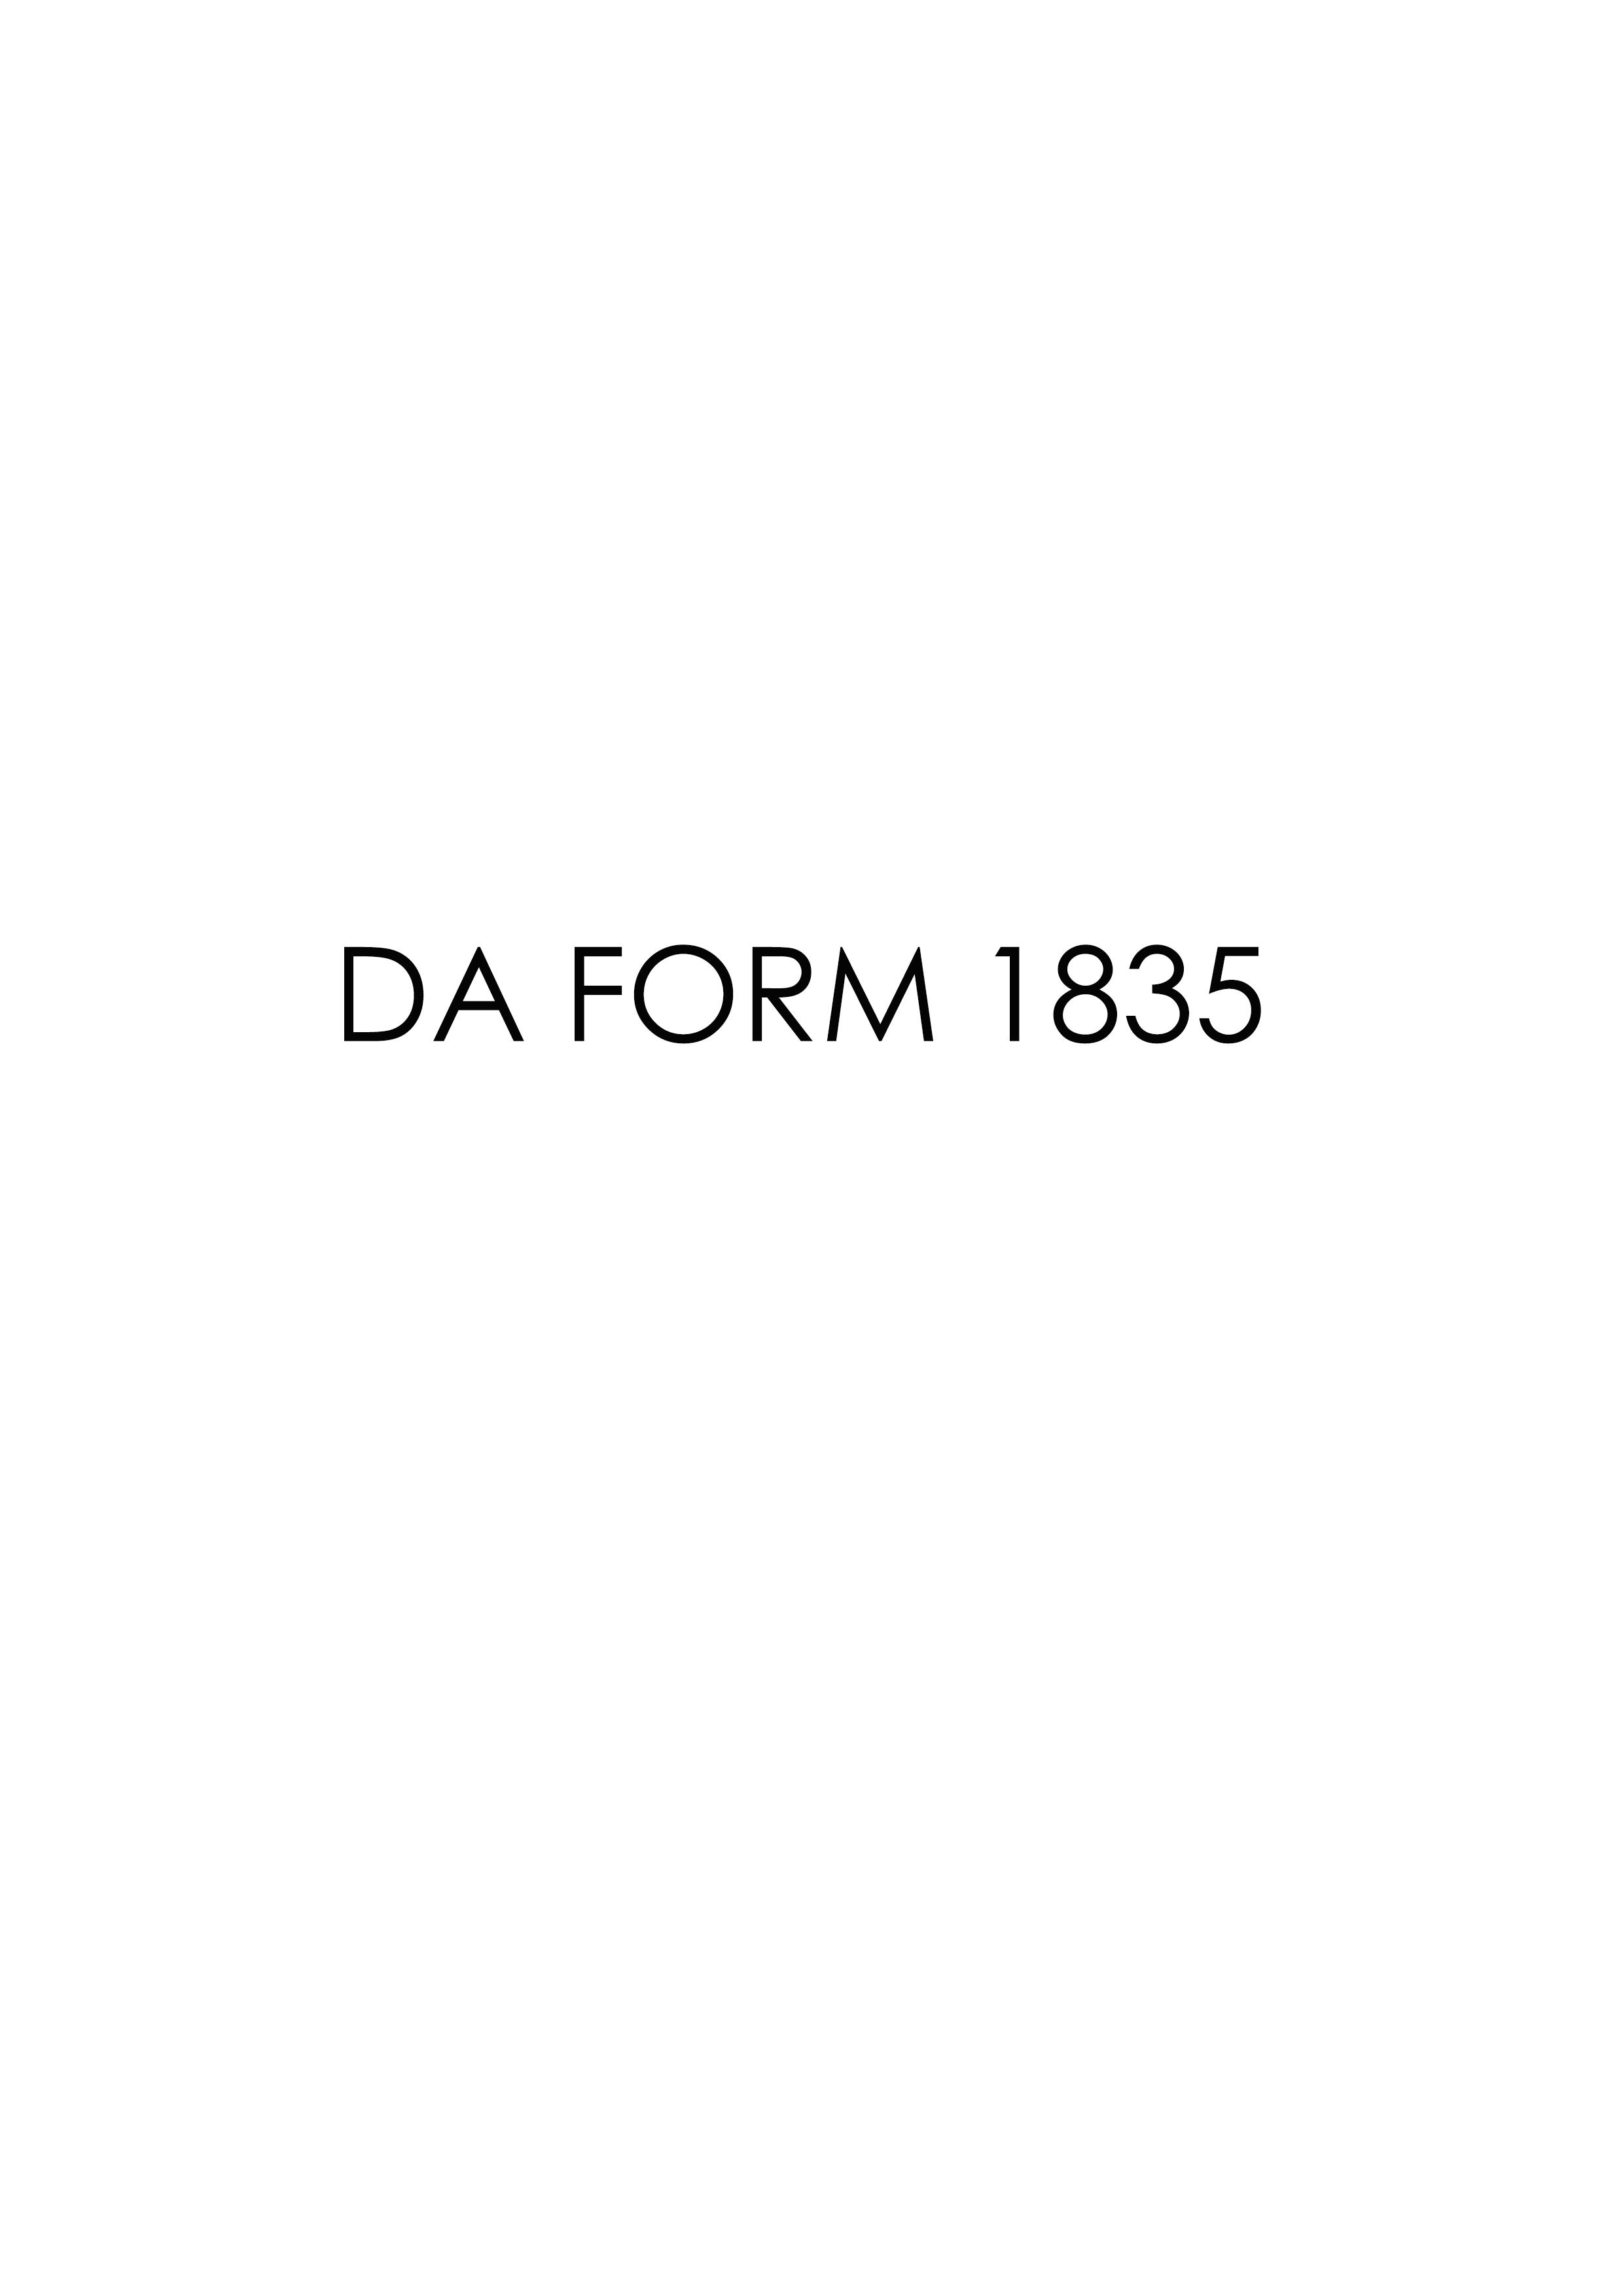 Download da Form 1835 Free